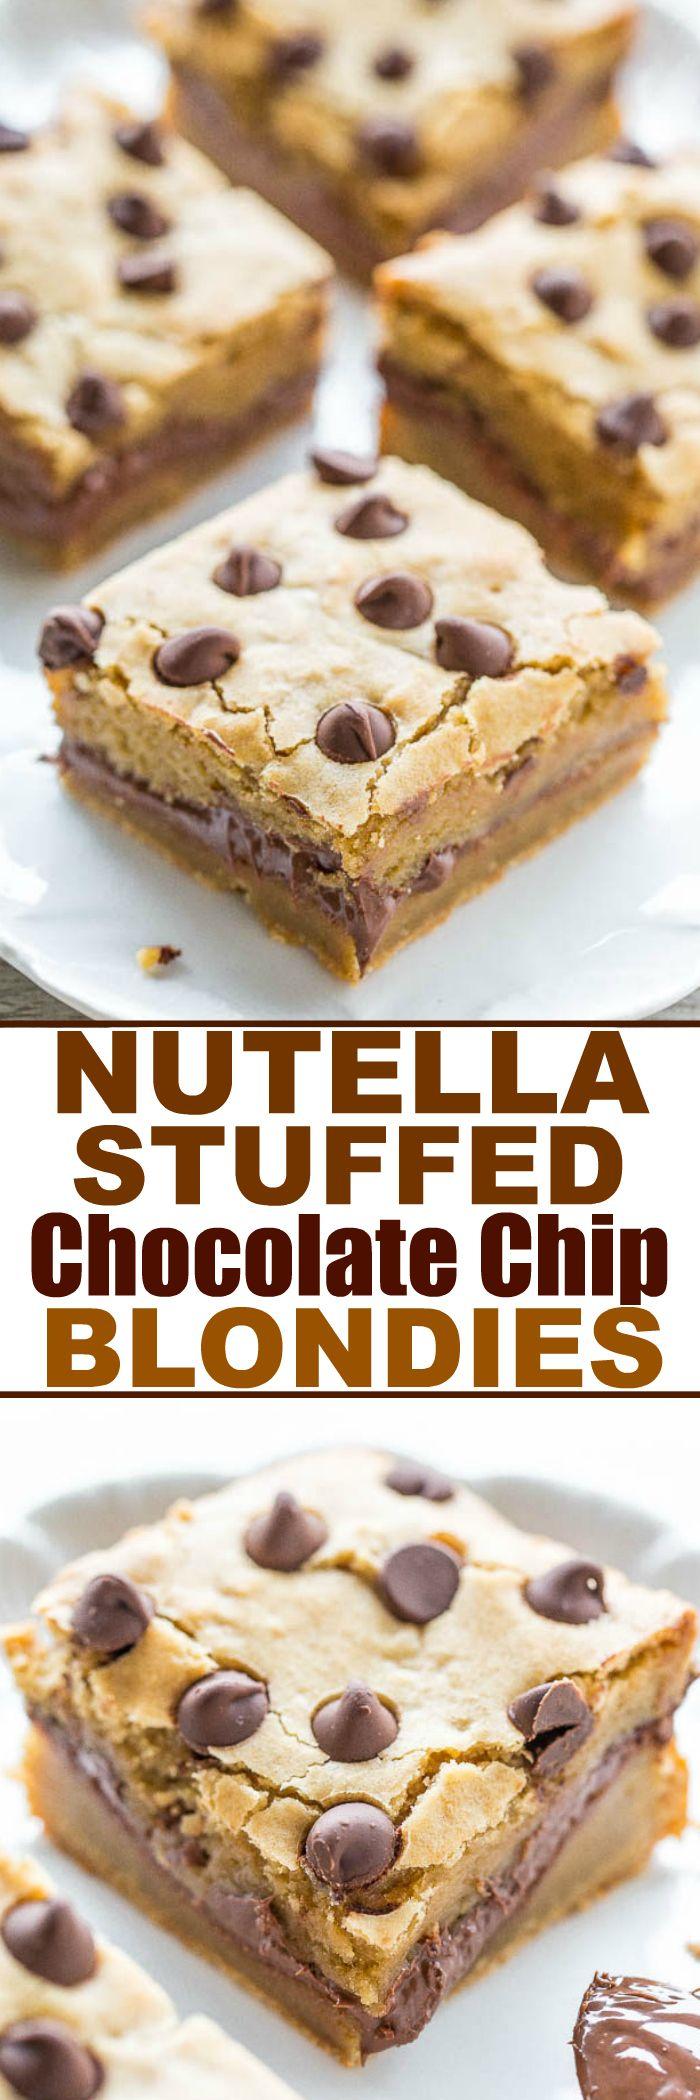 Nutella-Stuffed Chocolate Chip Blondies